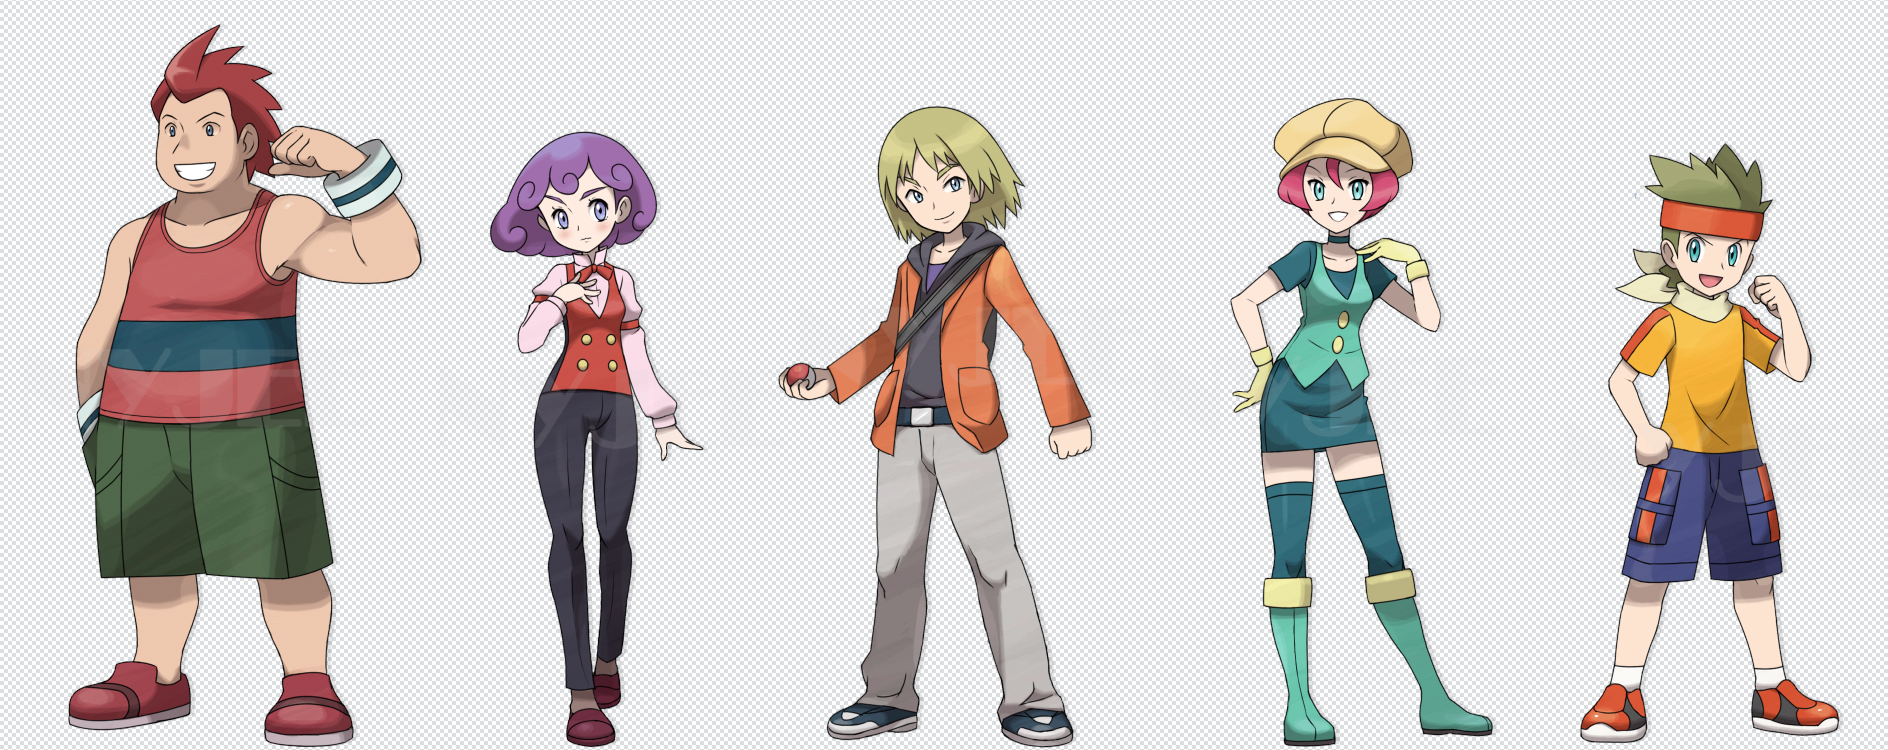 Langley pokmon zerochan anime image board pokmon download pokmon image altavistaventures Images